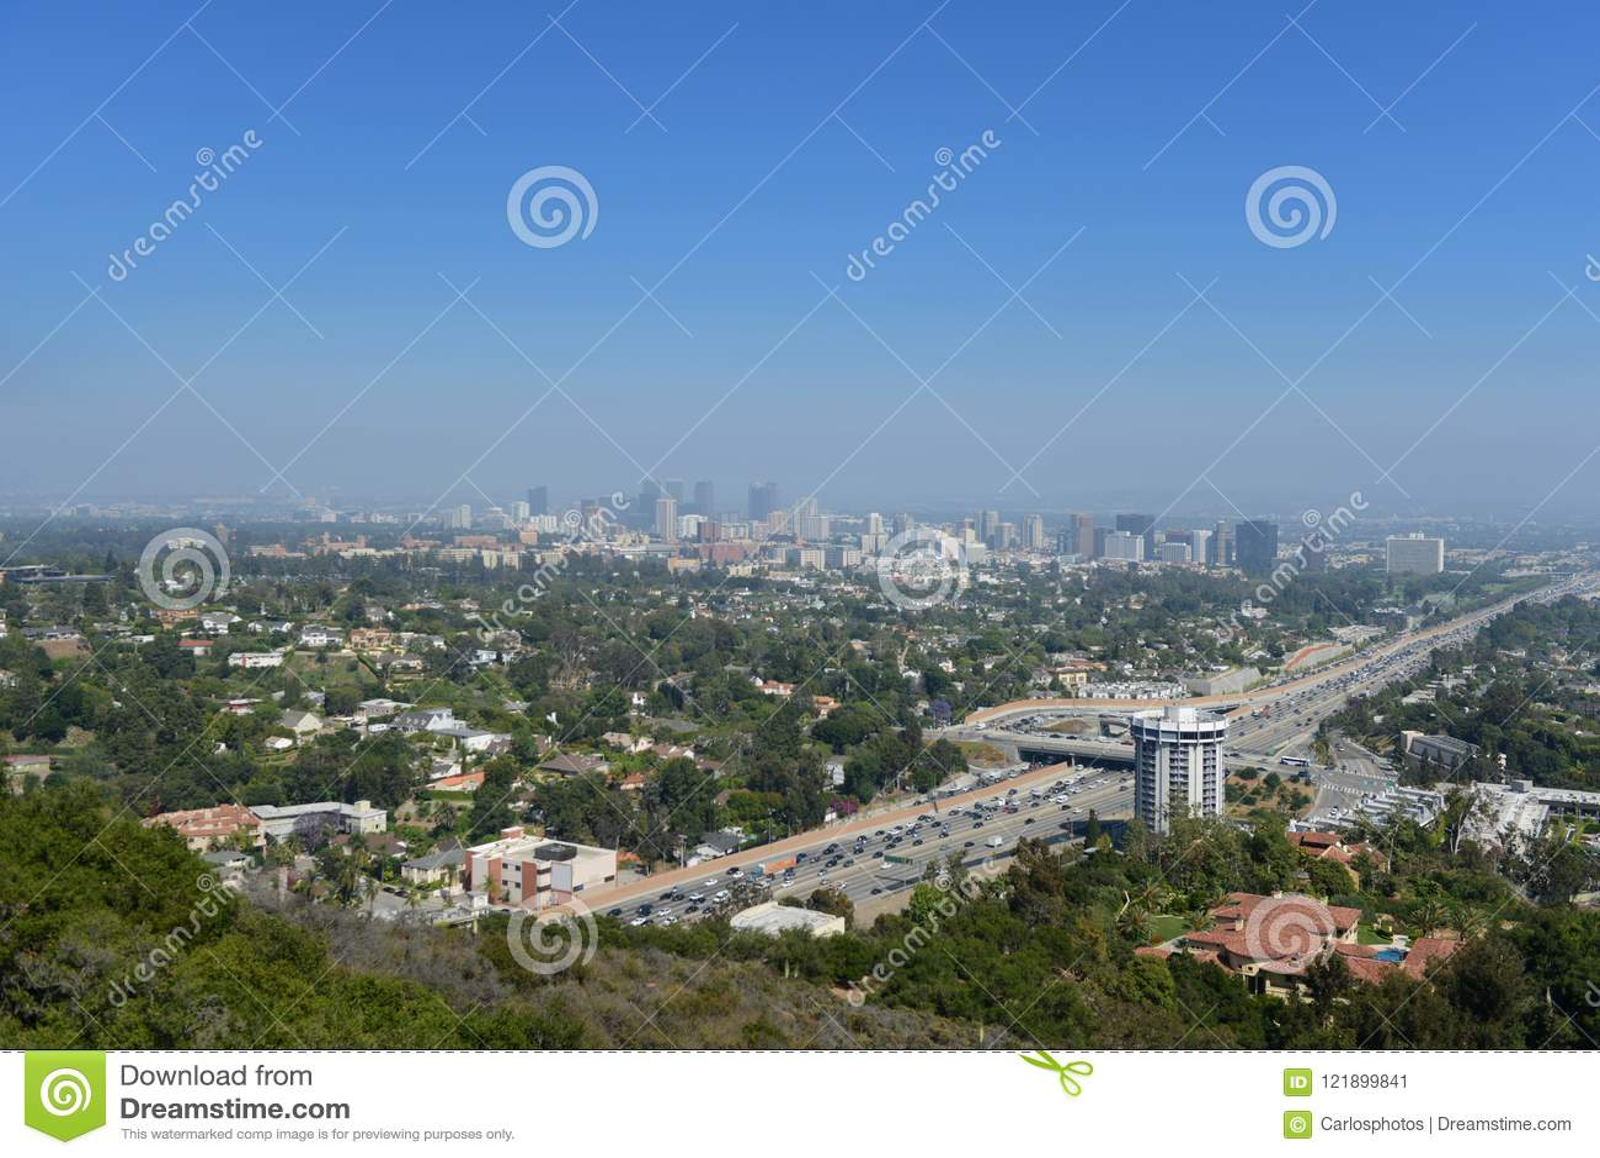 Panoramablick von Los Angeles